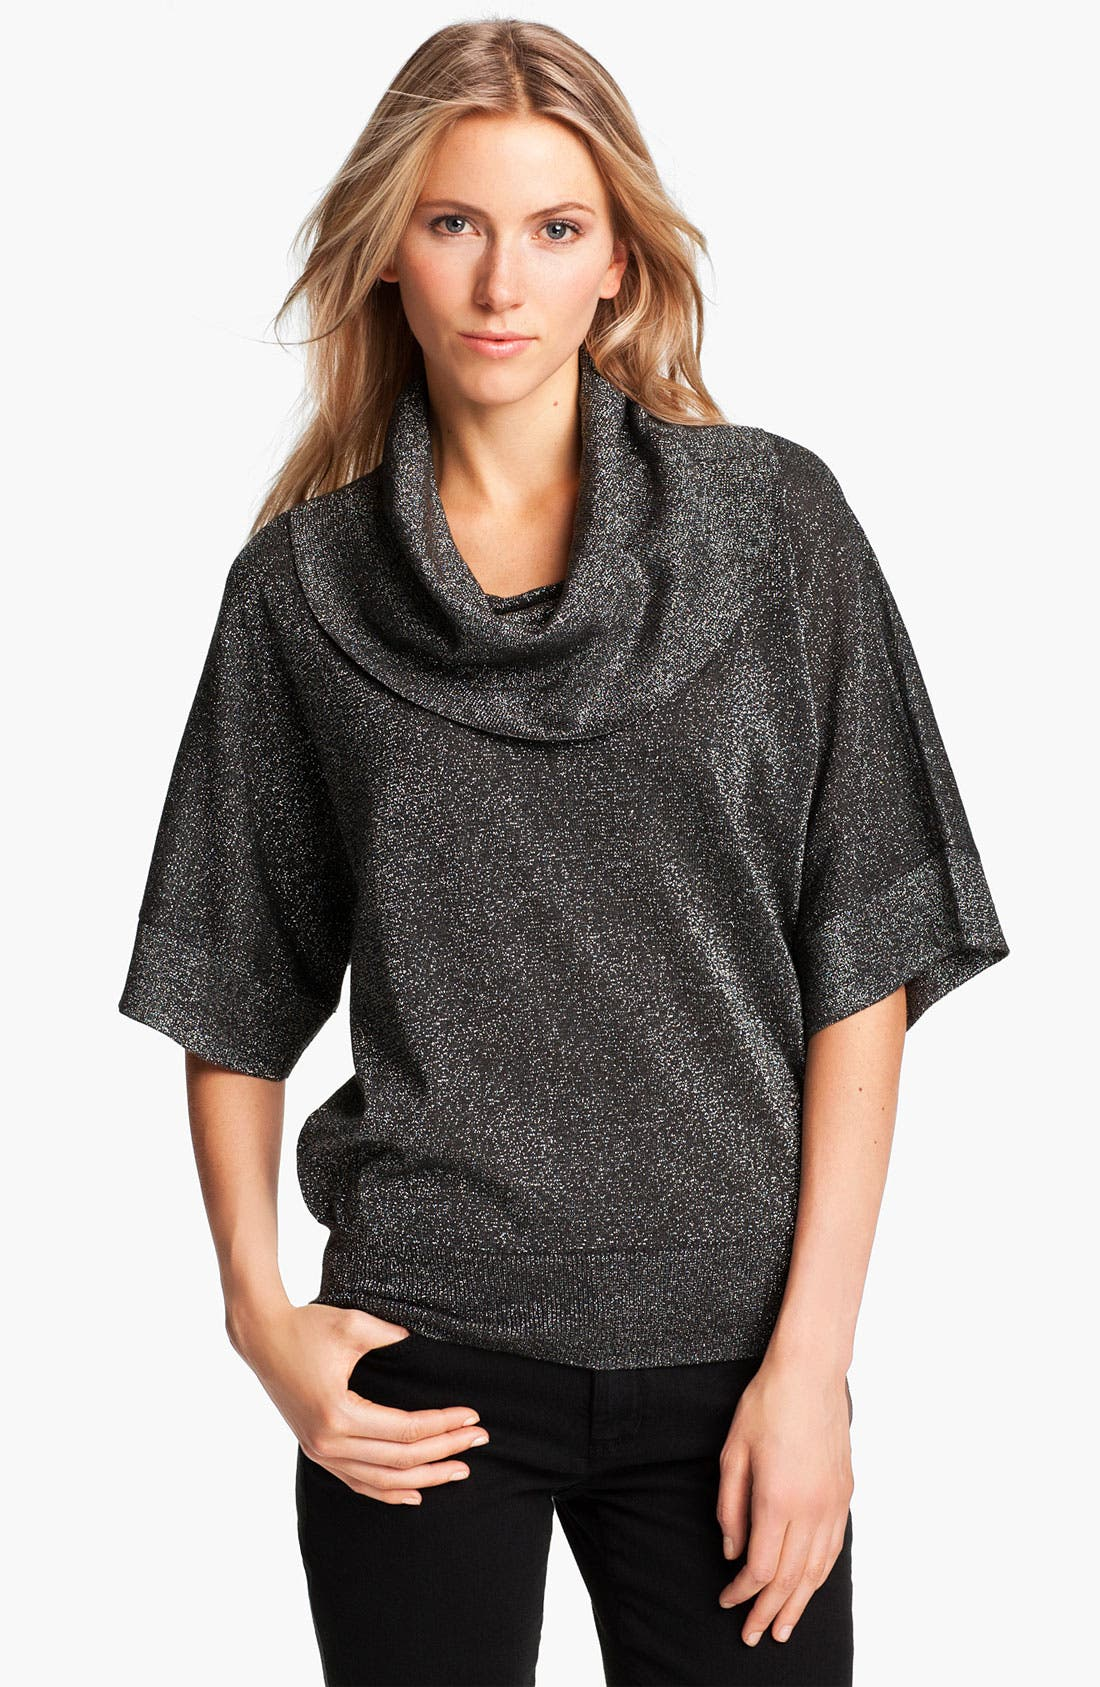 Main Image - MICHAEL Michael Kors Metallic Knit Sweater